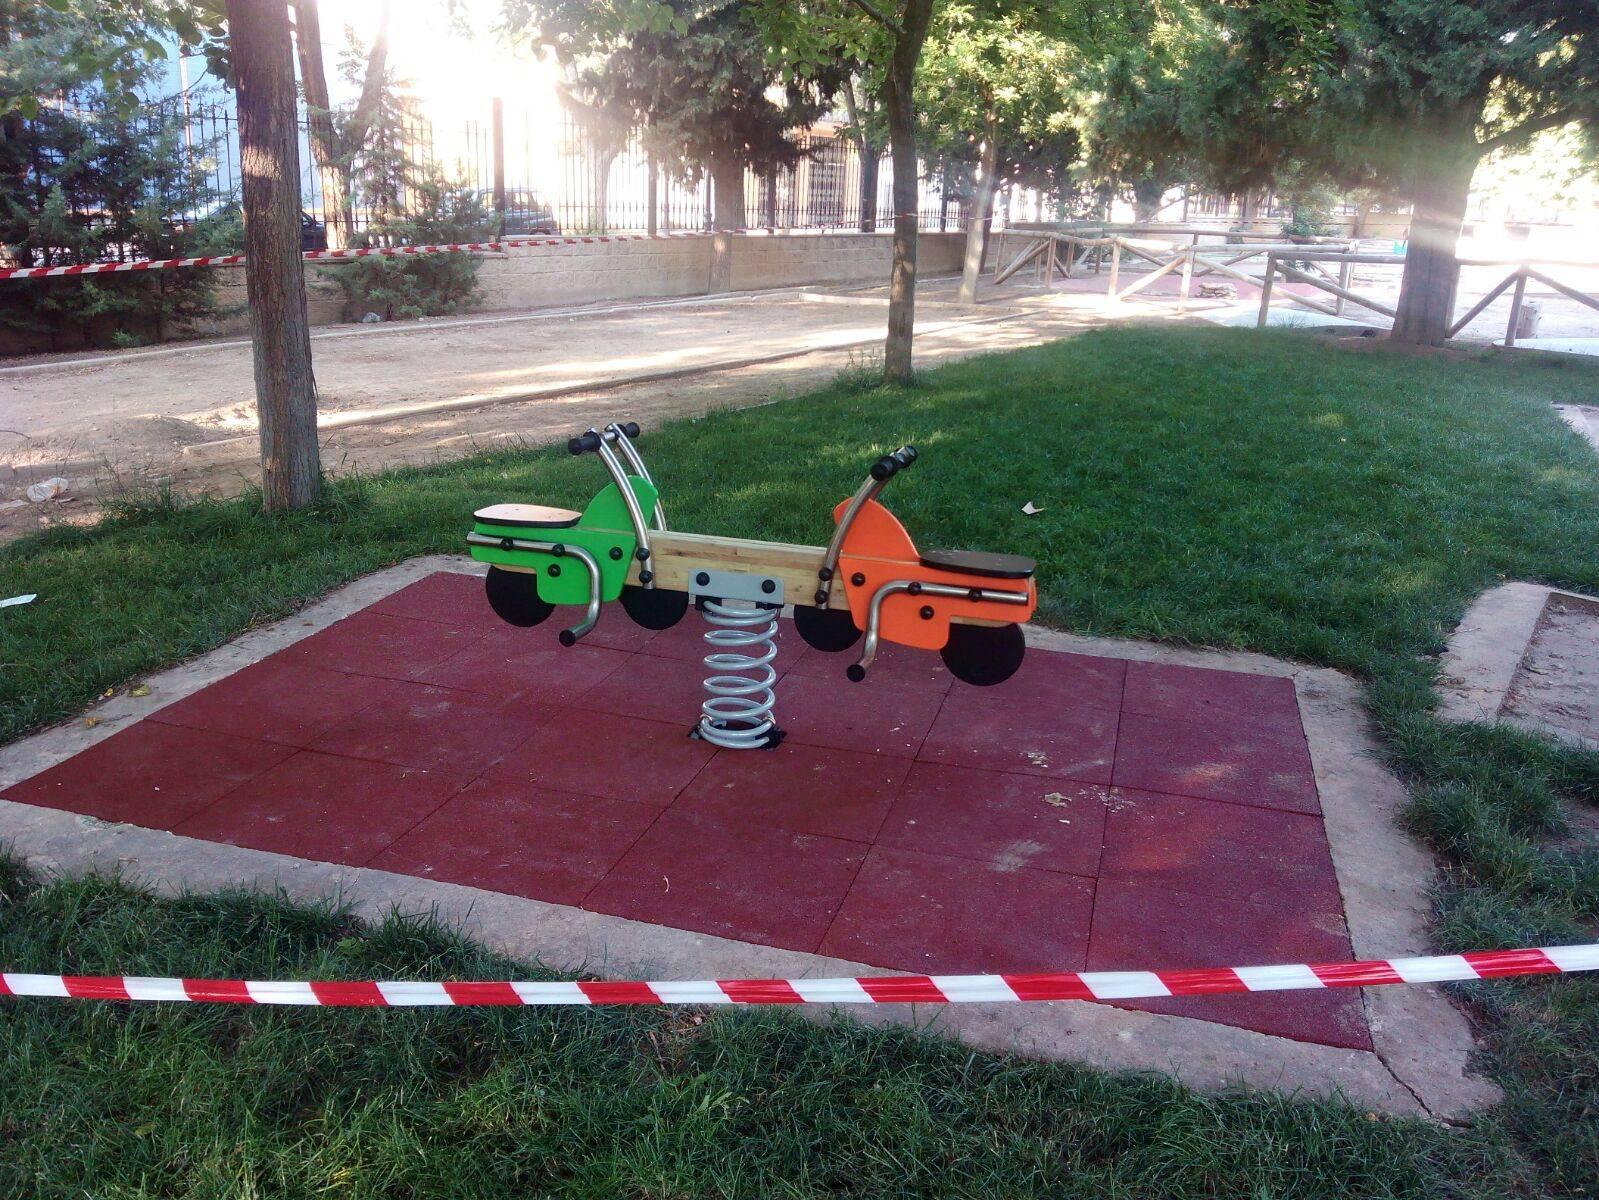 renovada zona infantil parque municipal herencia 3 - Renovada la zona infantil del Parque Municipal de Herencia